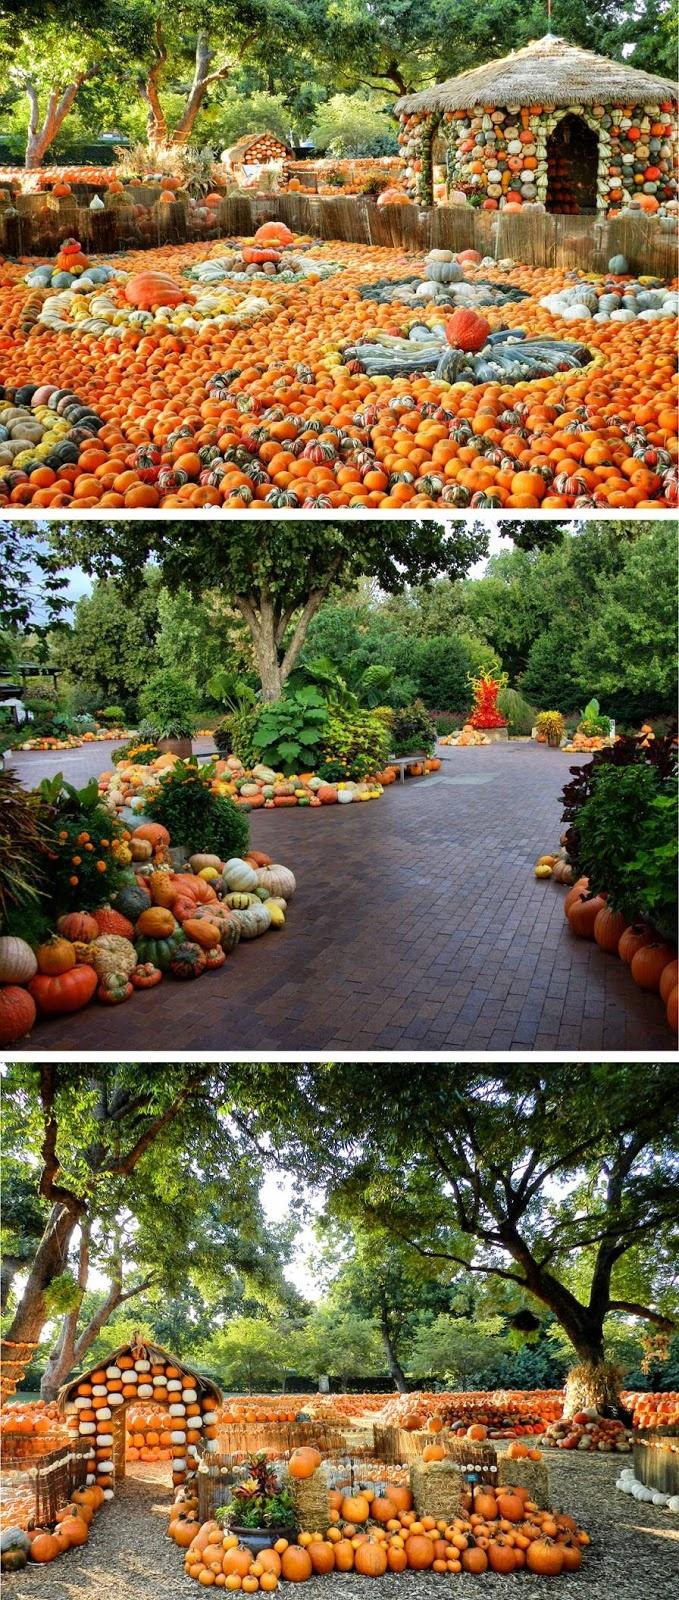 Sports And Stuff: Dallas Arboretum Autumn Display